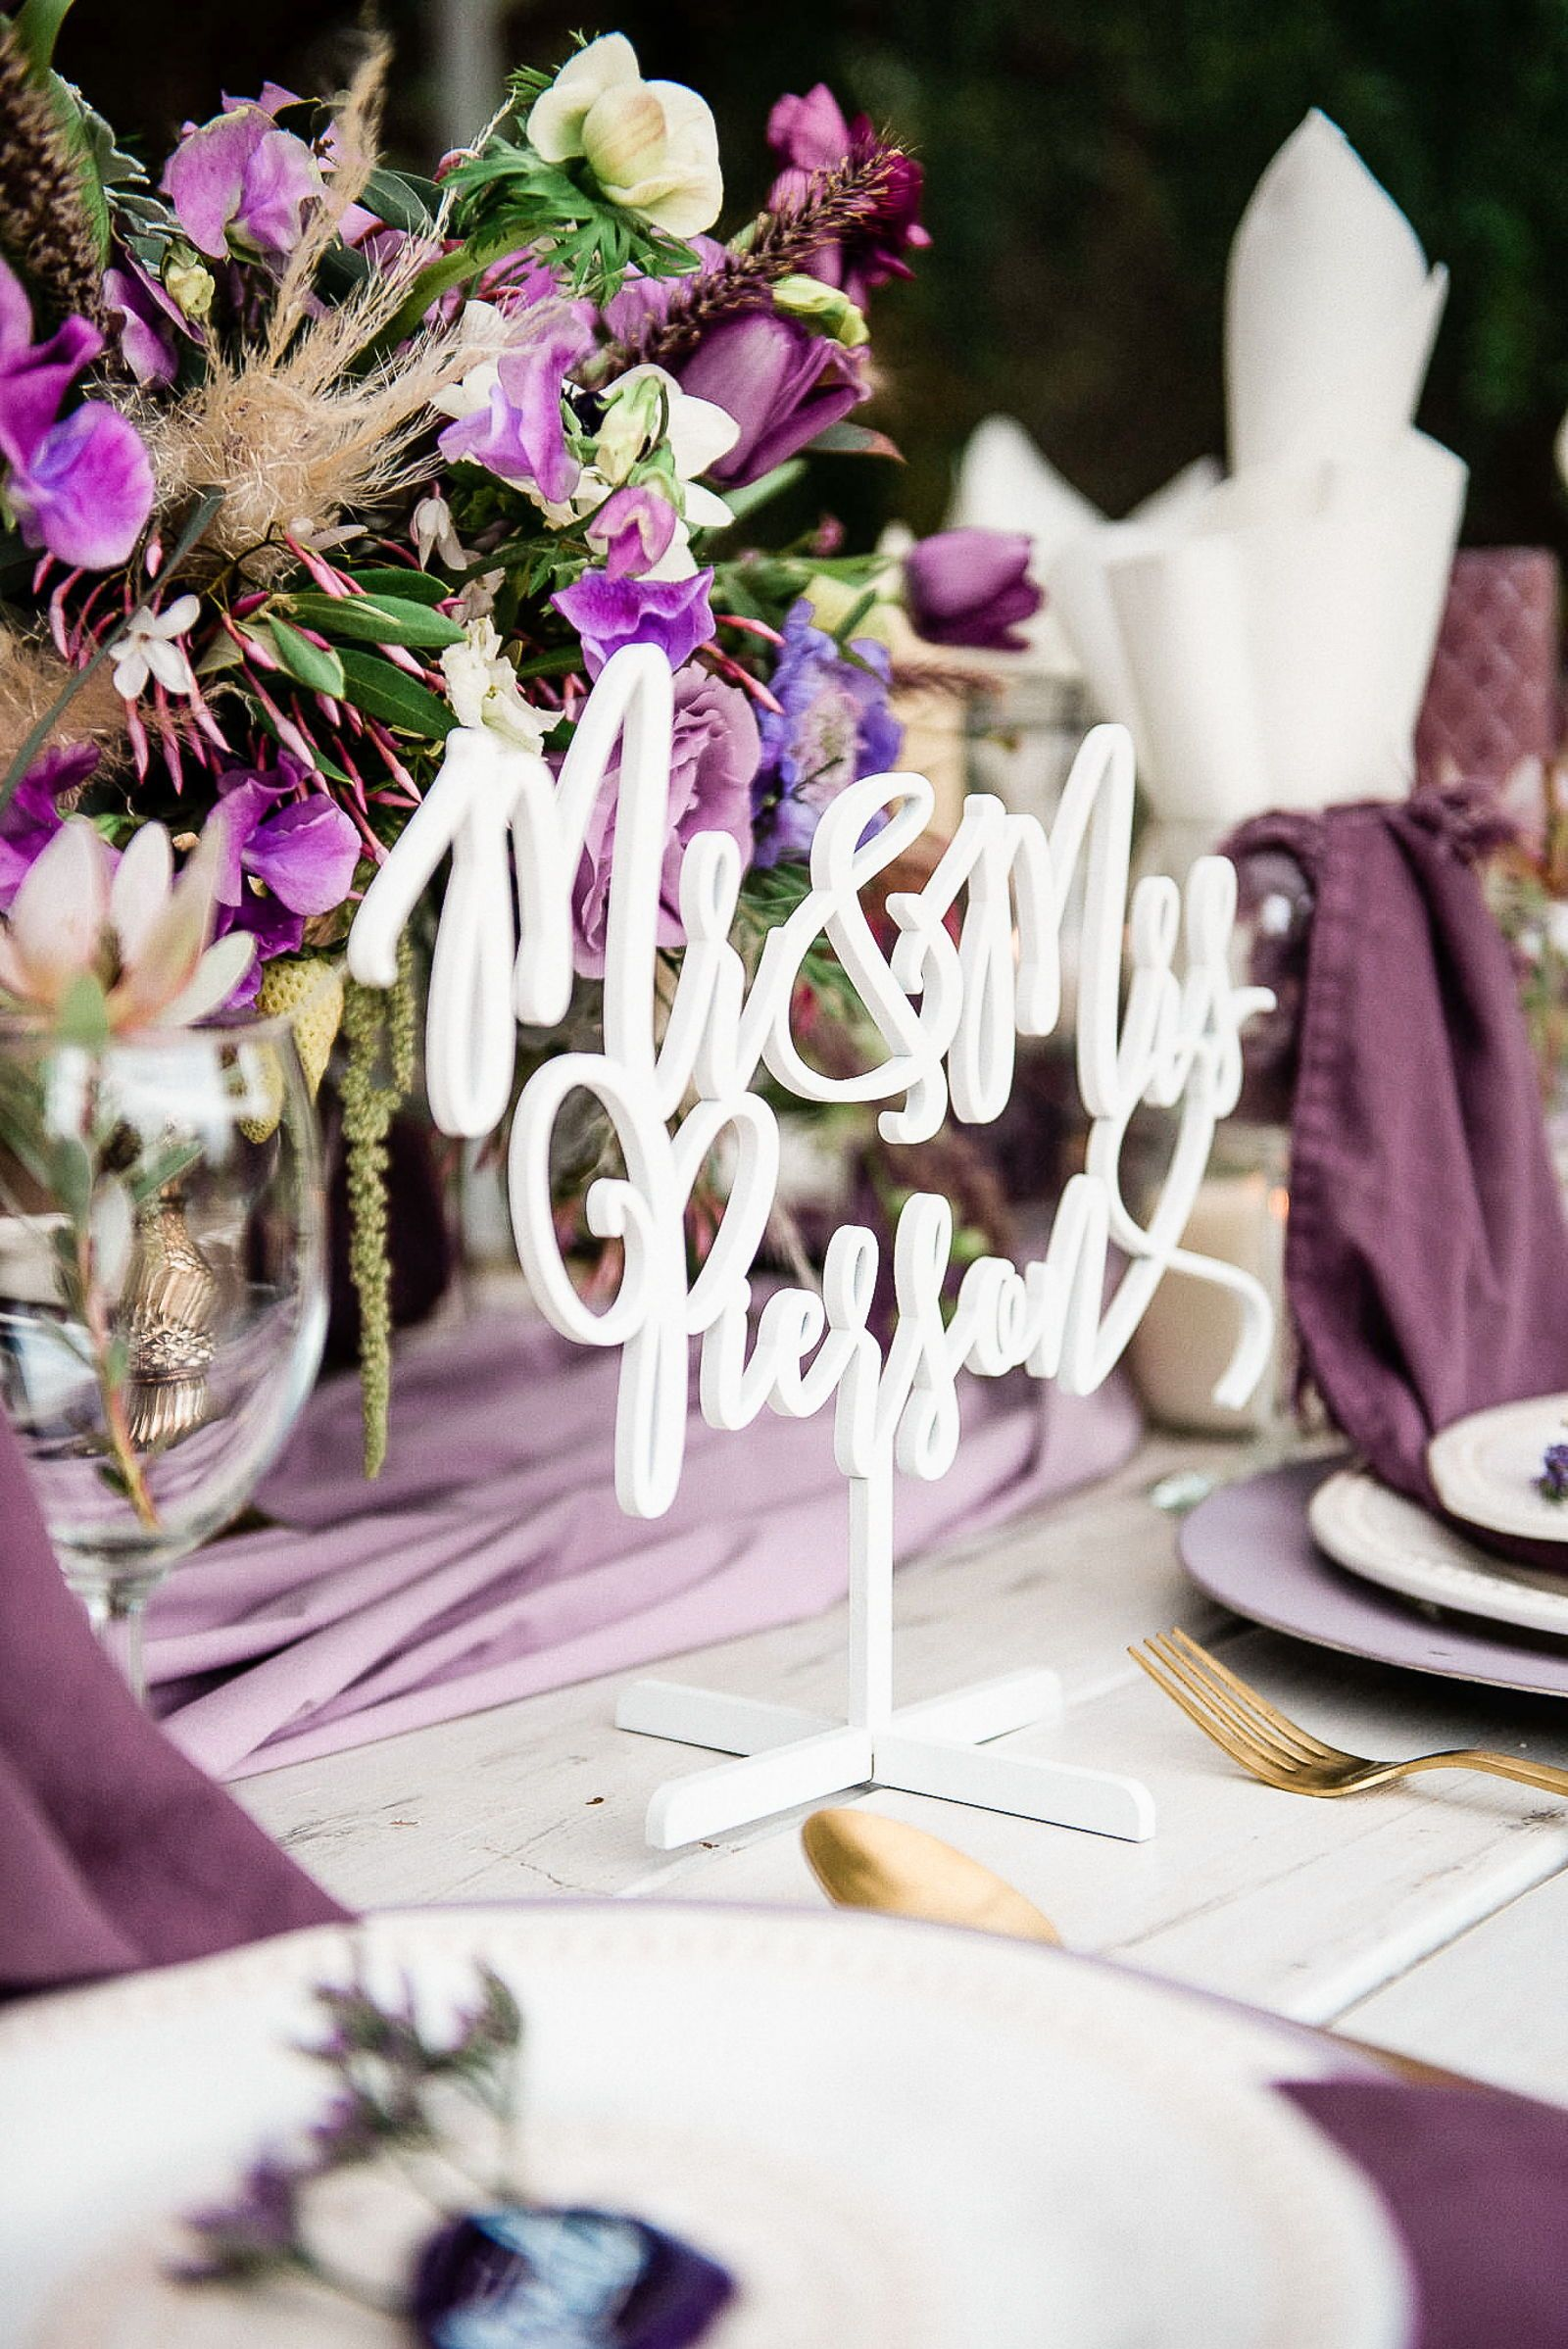 Mr Mrs Name Sign For Wedding Table Decor Handmade Wedding Decor Gifts At Www Zcreatedesi Wedding Table Wedding Centerpieces Beautiful Wedding Centerpiece